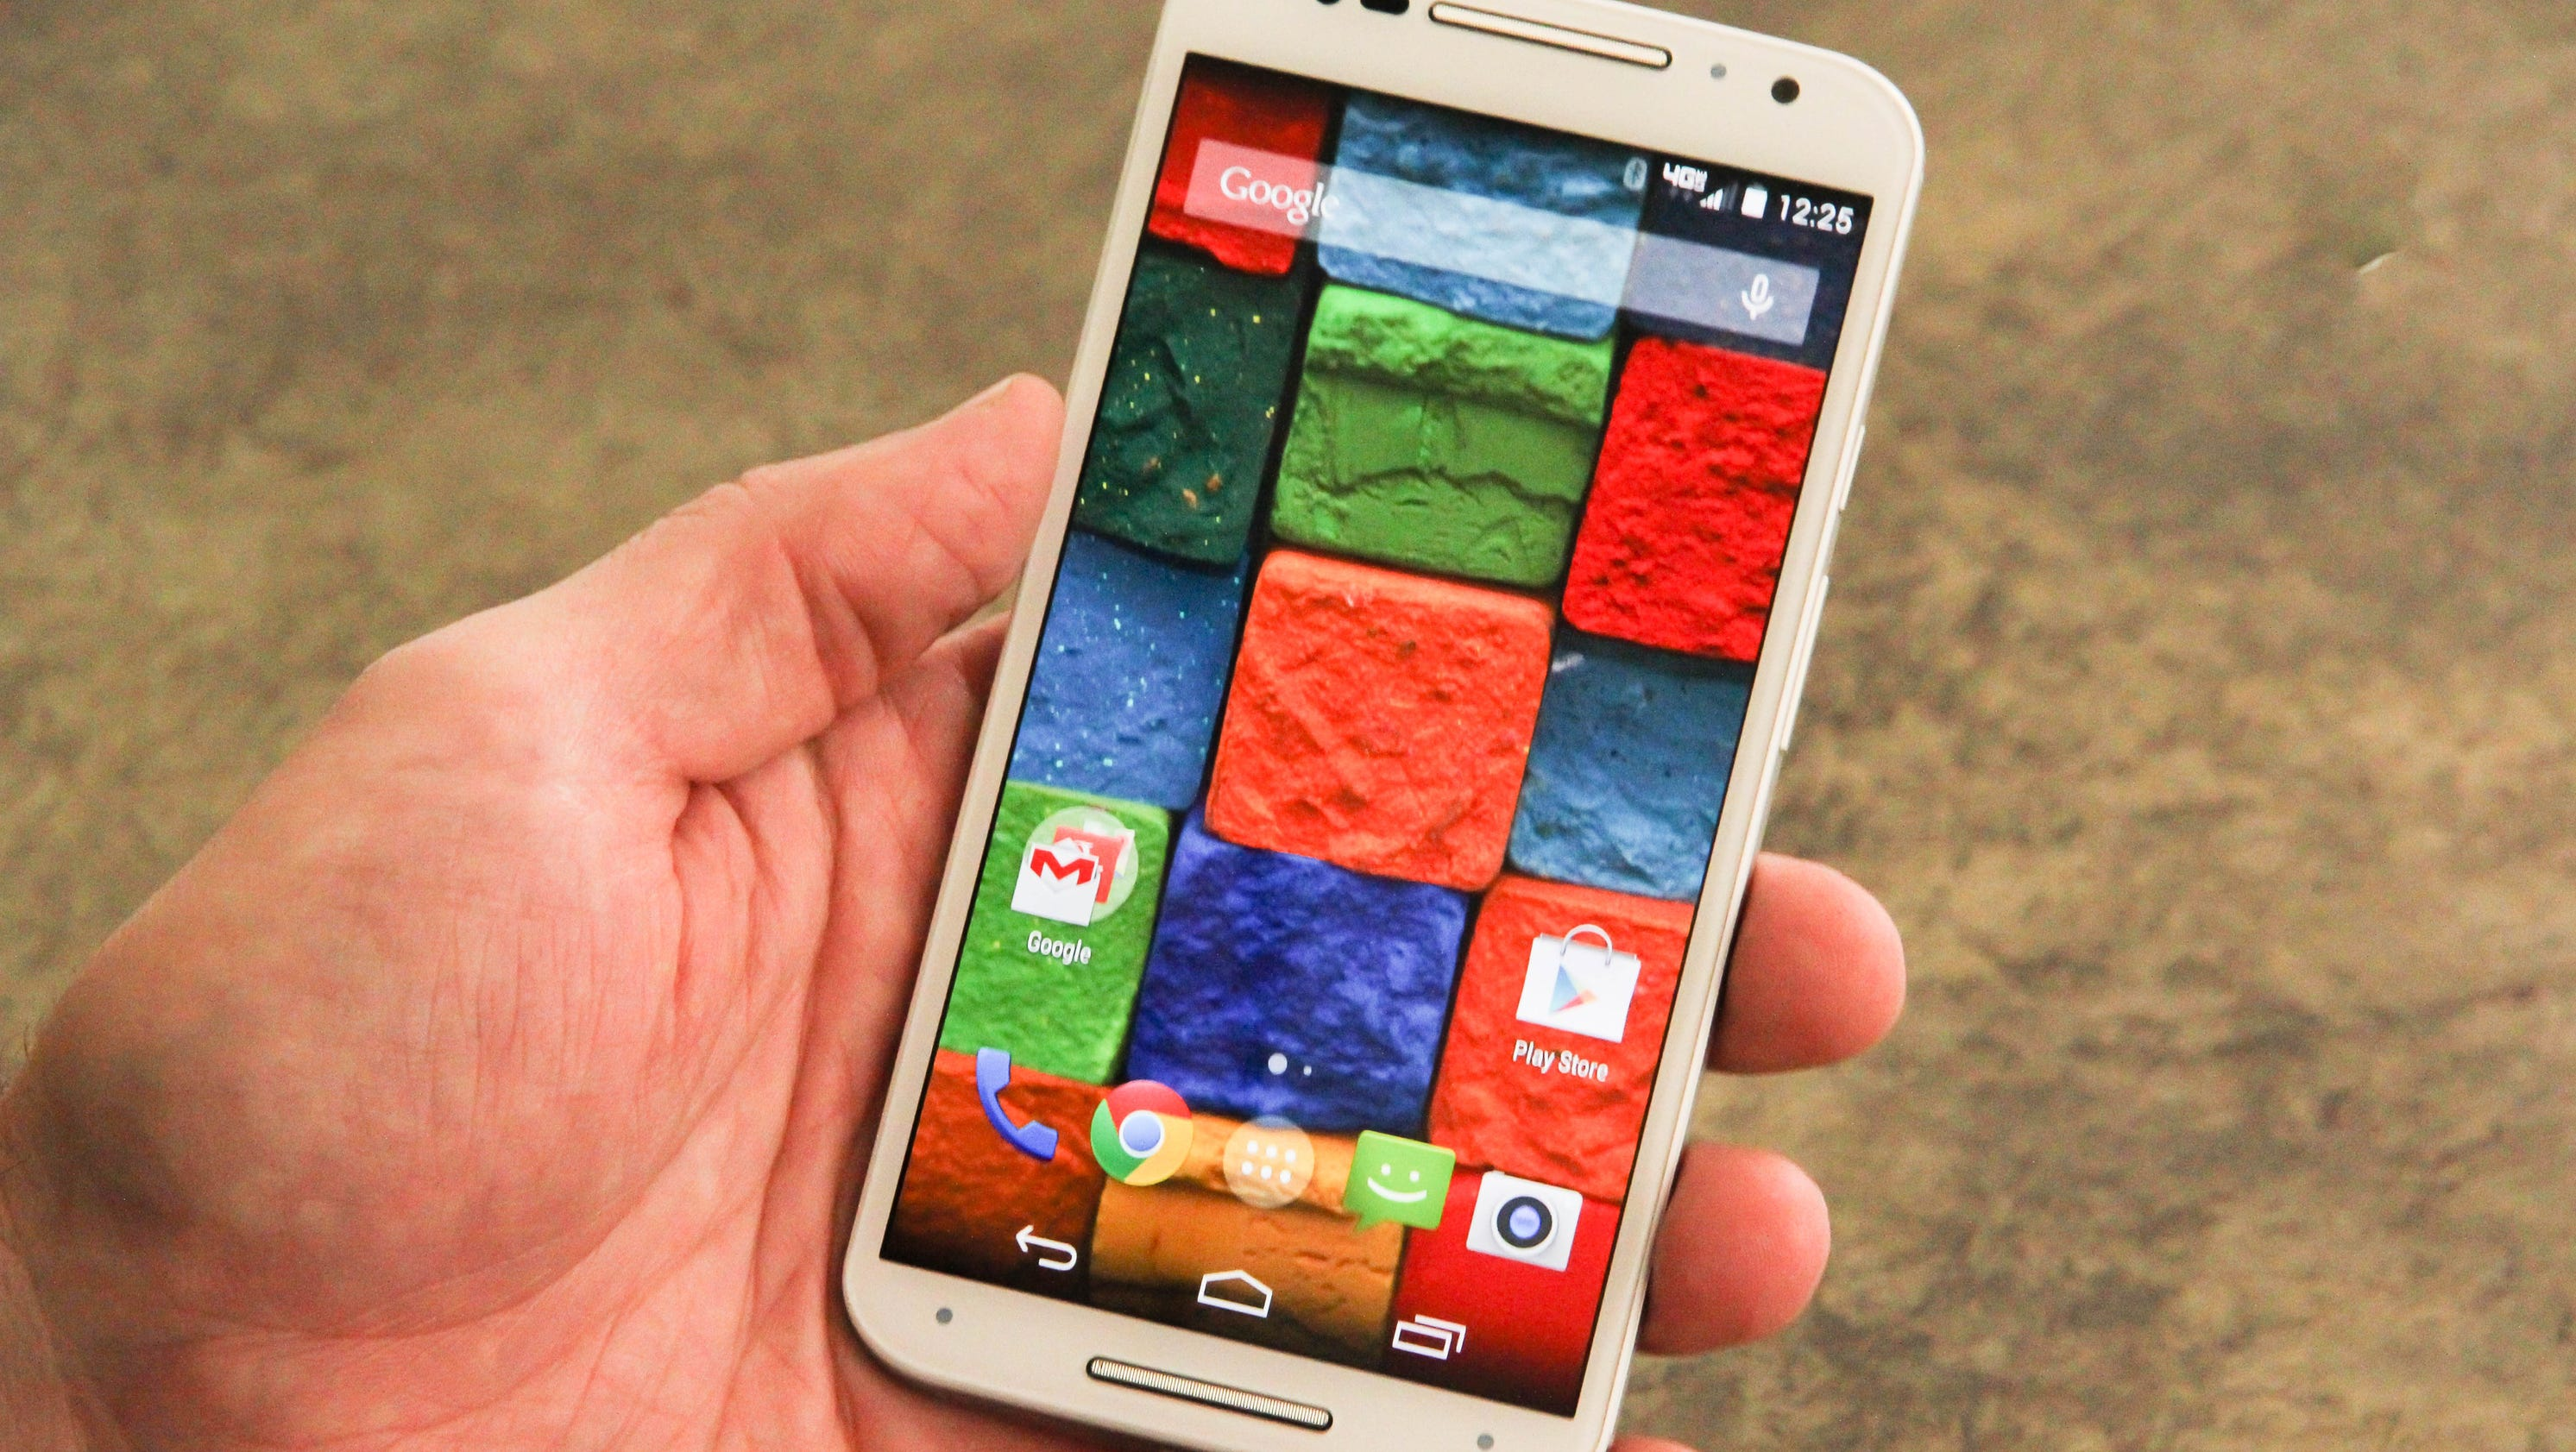 Motorola unveils new Moto X, Moto G smartphones